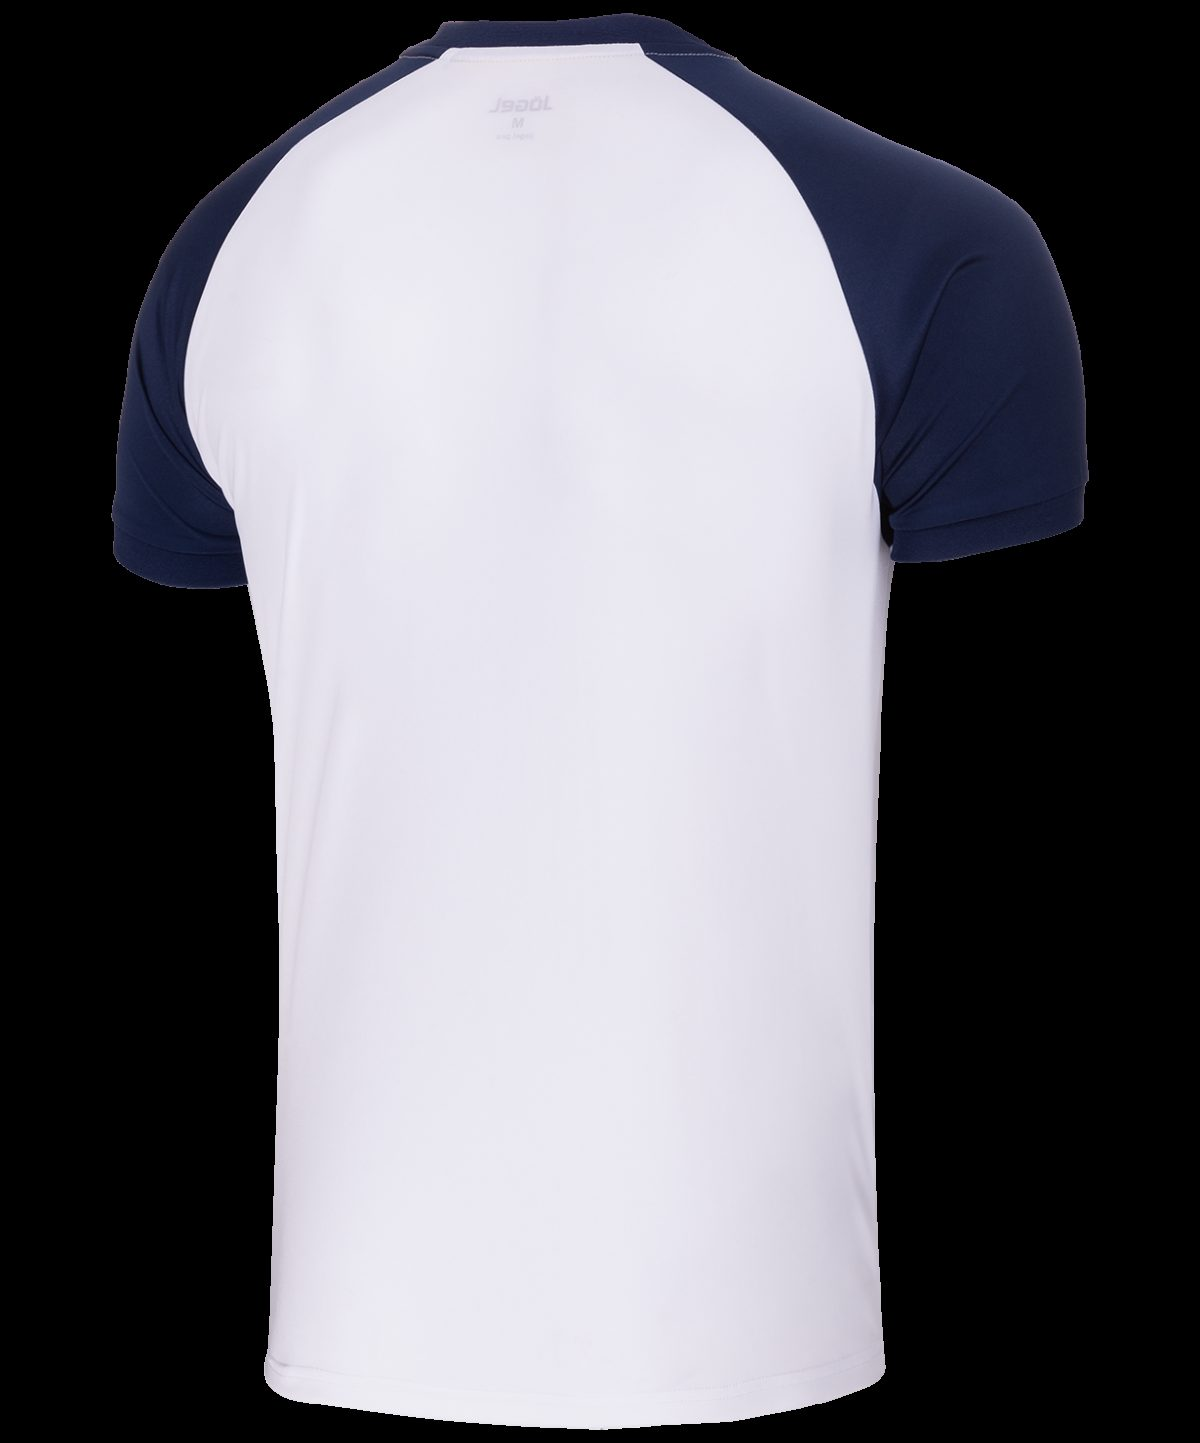 JOGEL Футболка футбольная, белый/темно-синий   JFT-1011-019 - 2